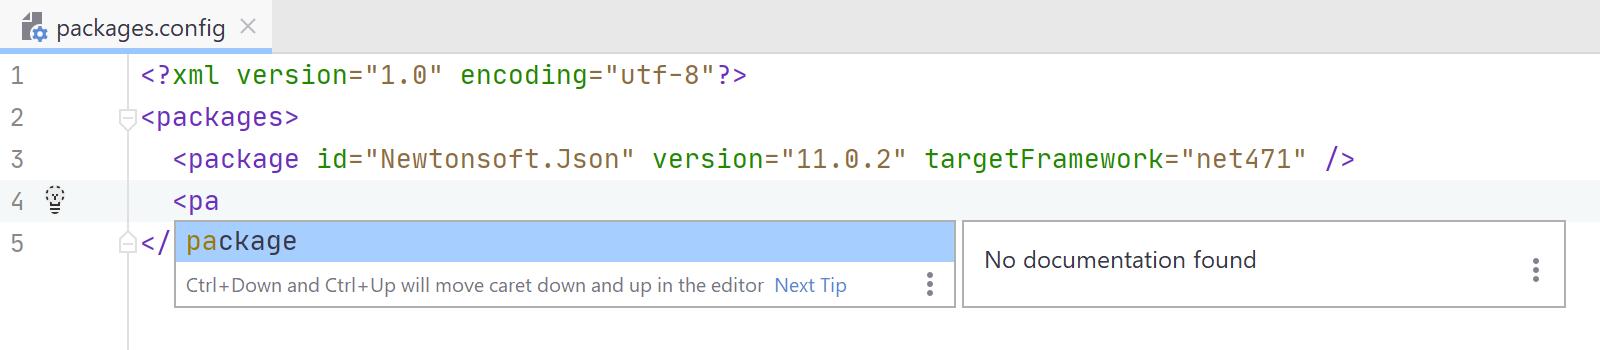 JetBrainsRider: Coding assistance in NuGet configuration files